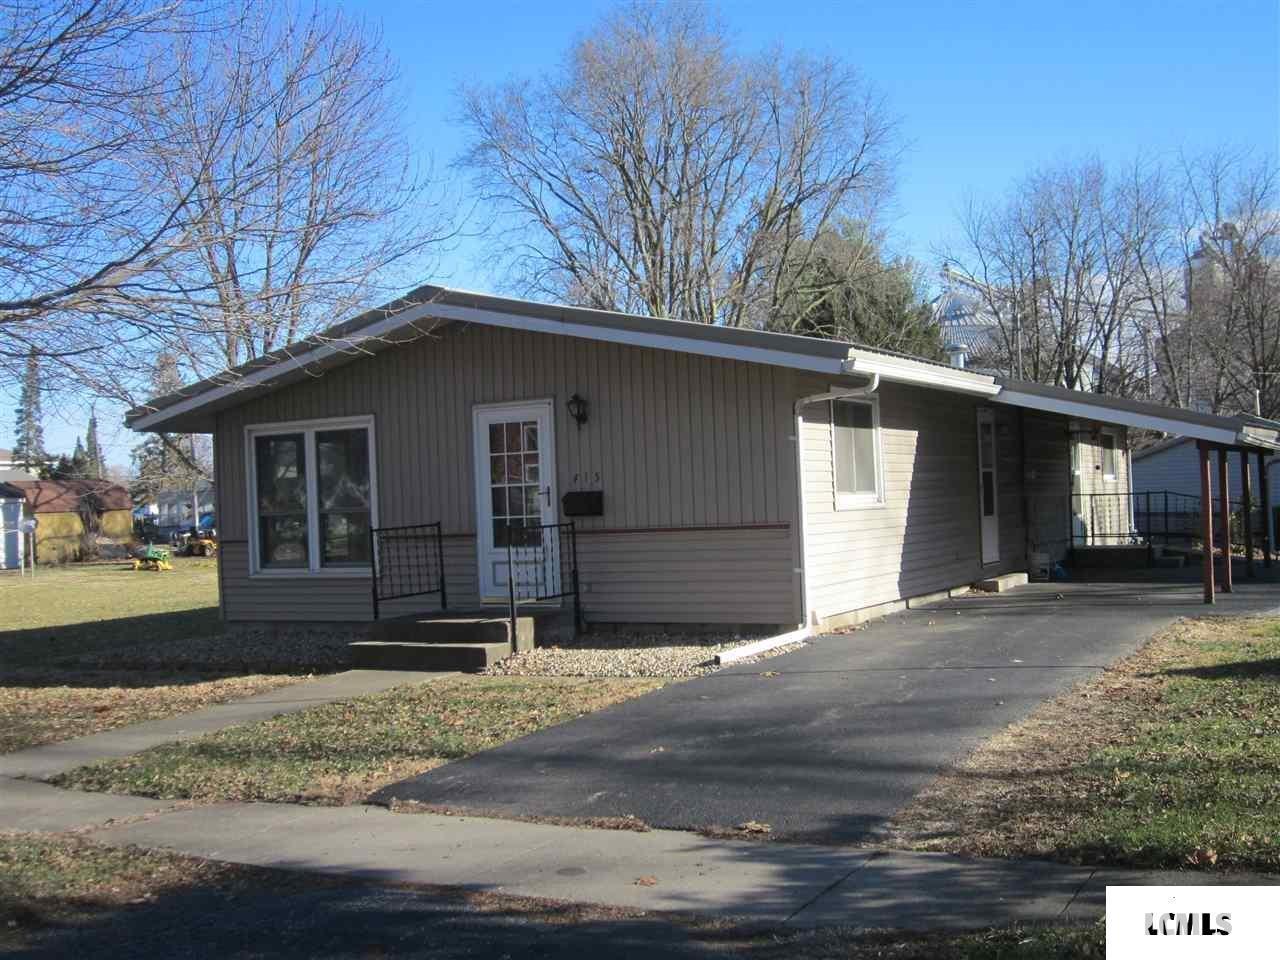 415 S MAIN Property Photo - Mason City, IL real estate listing